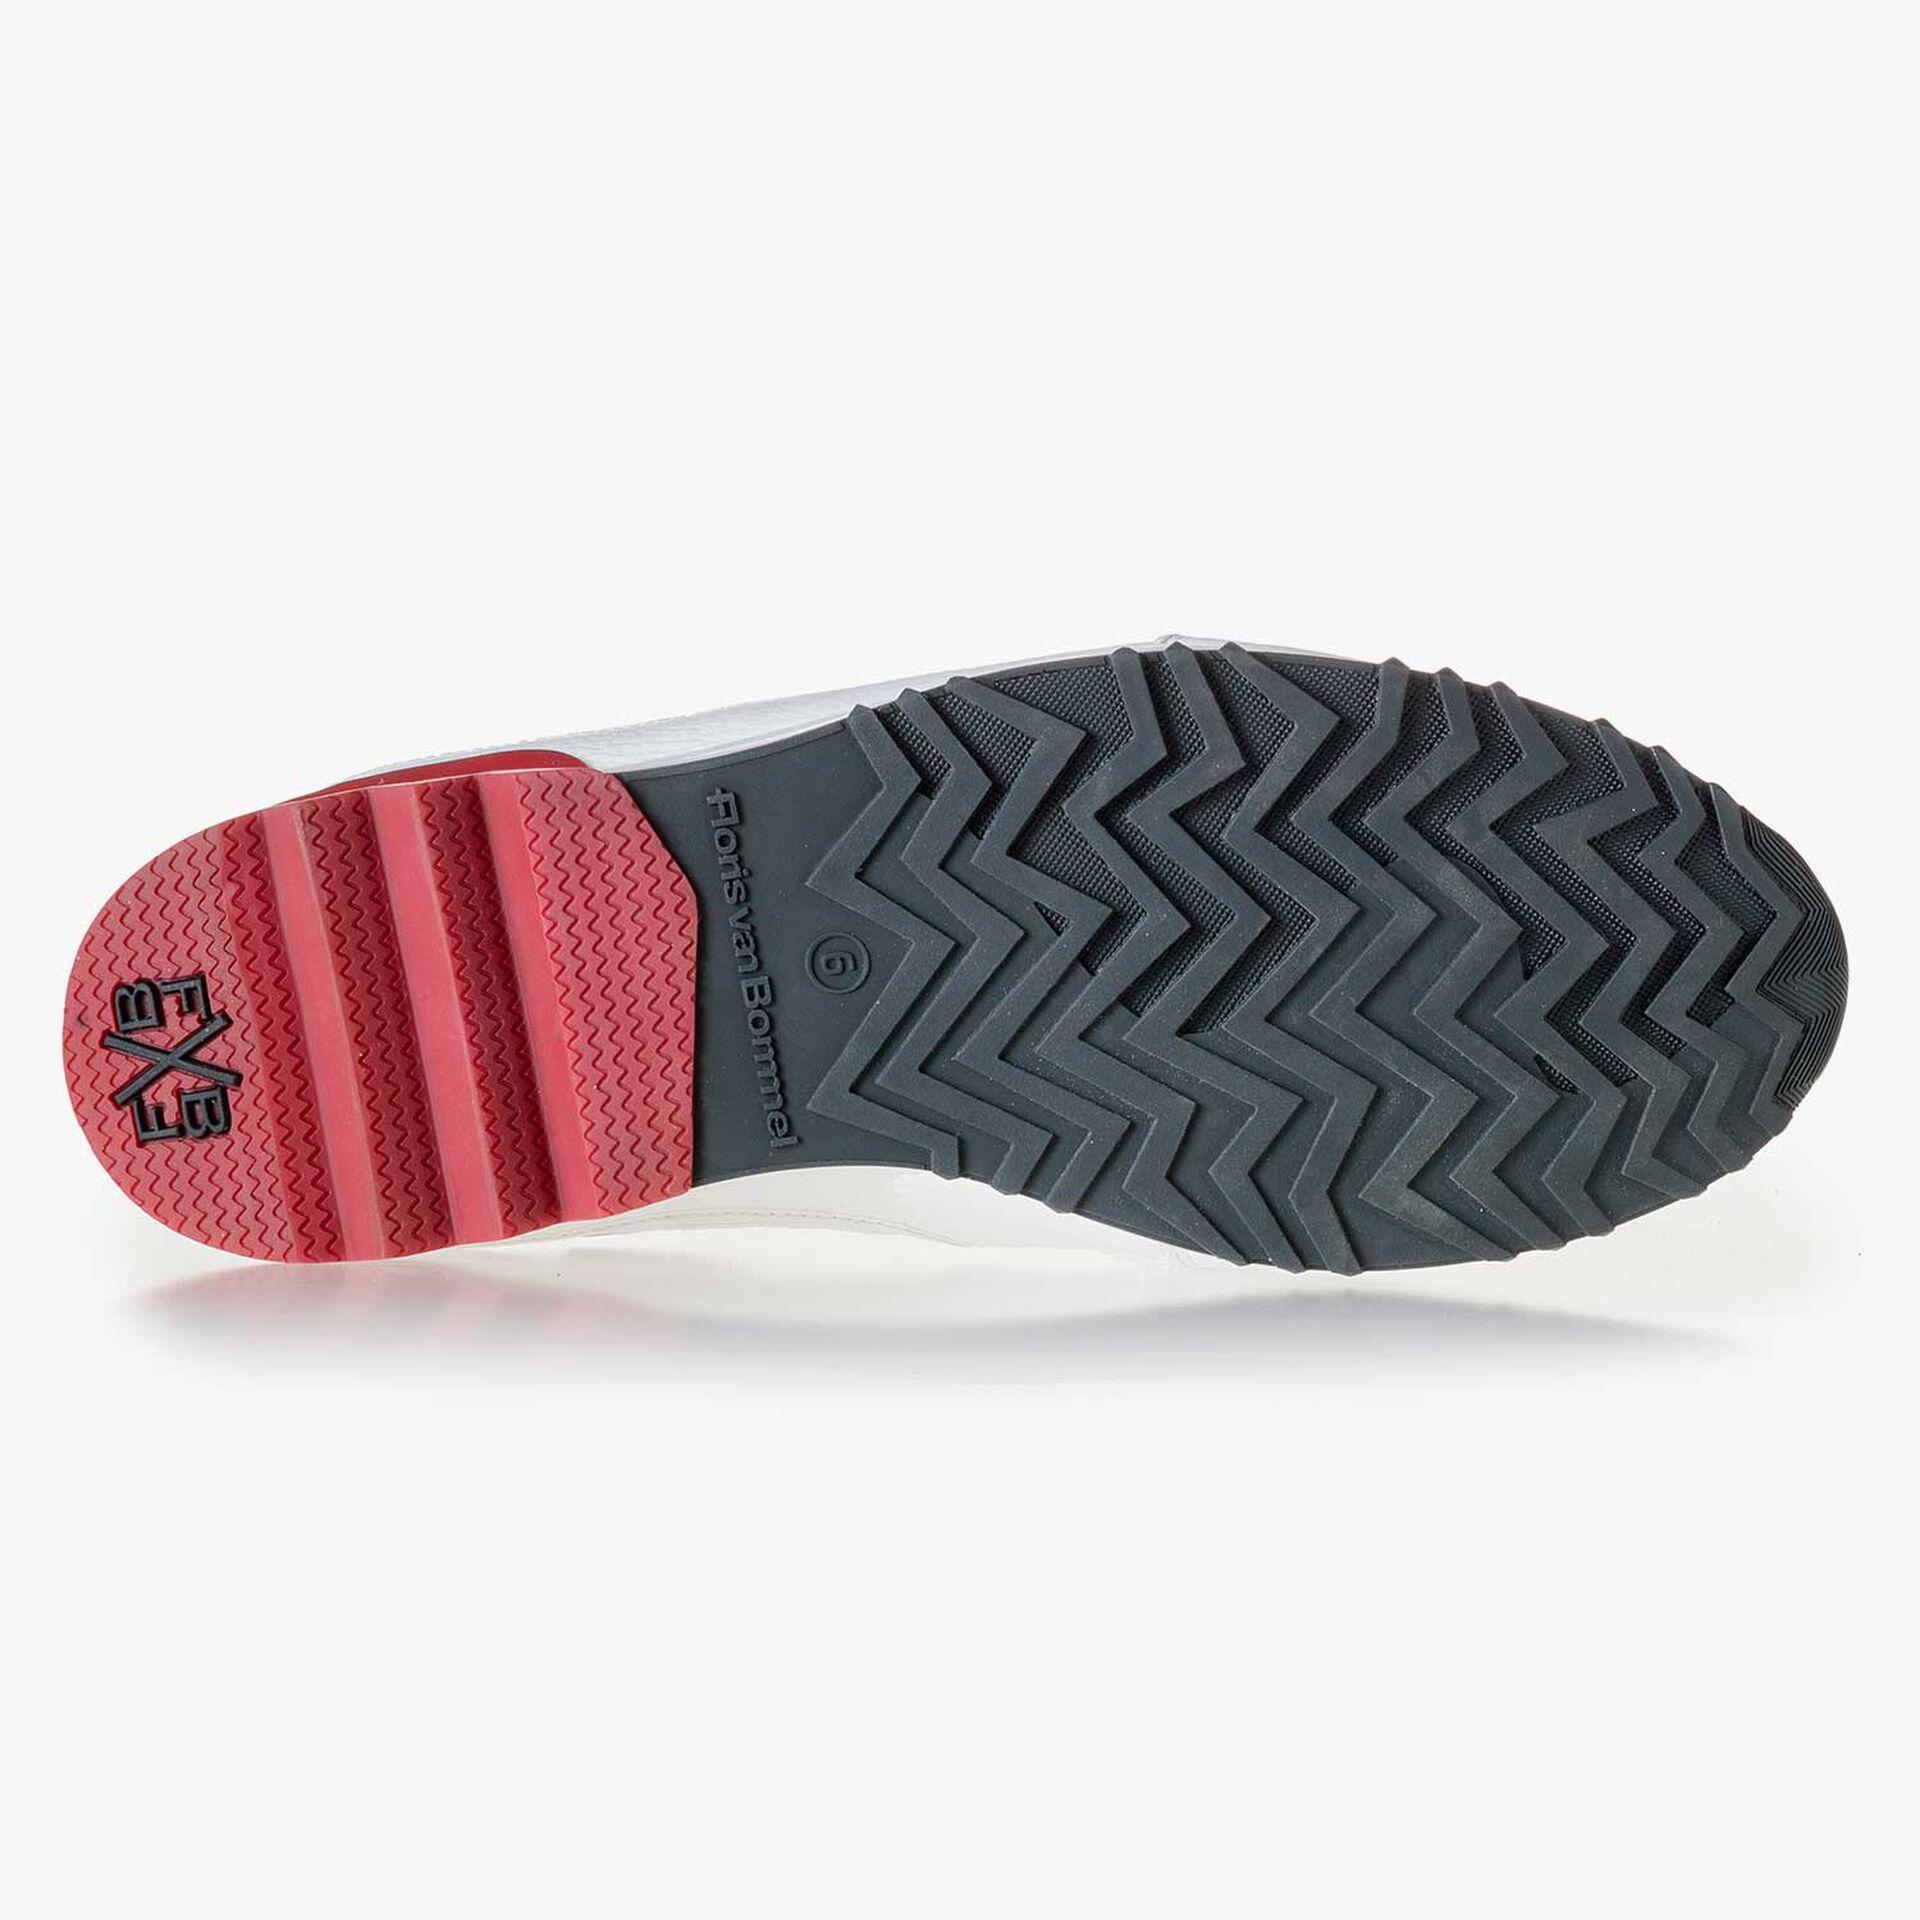 White calf's leather sneaker